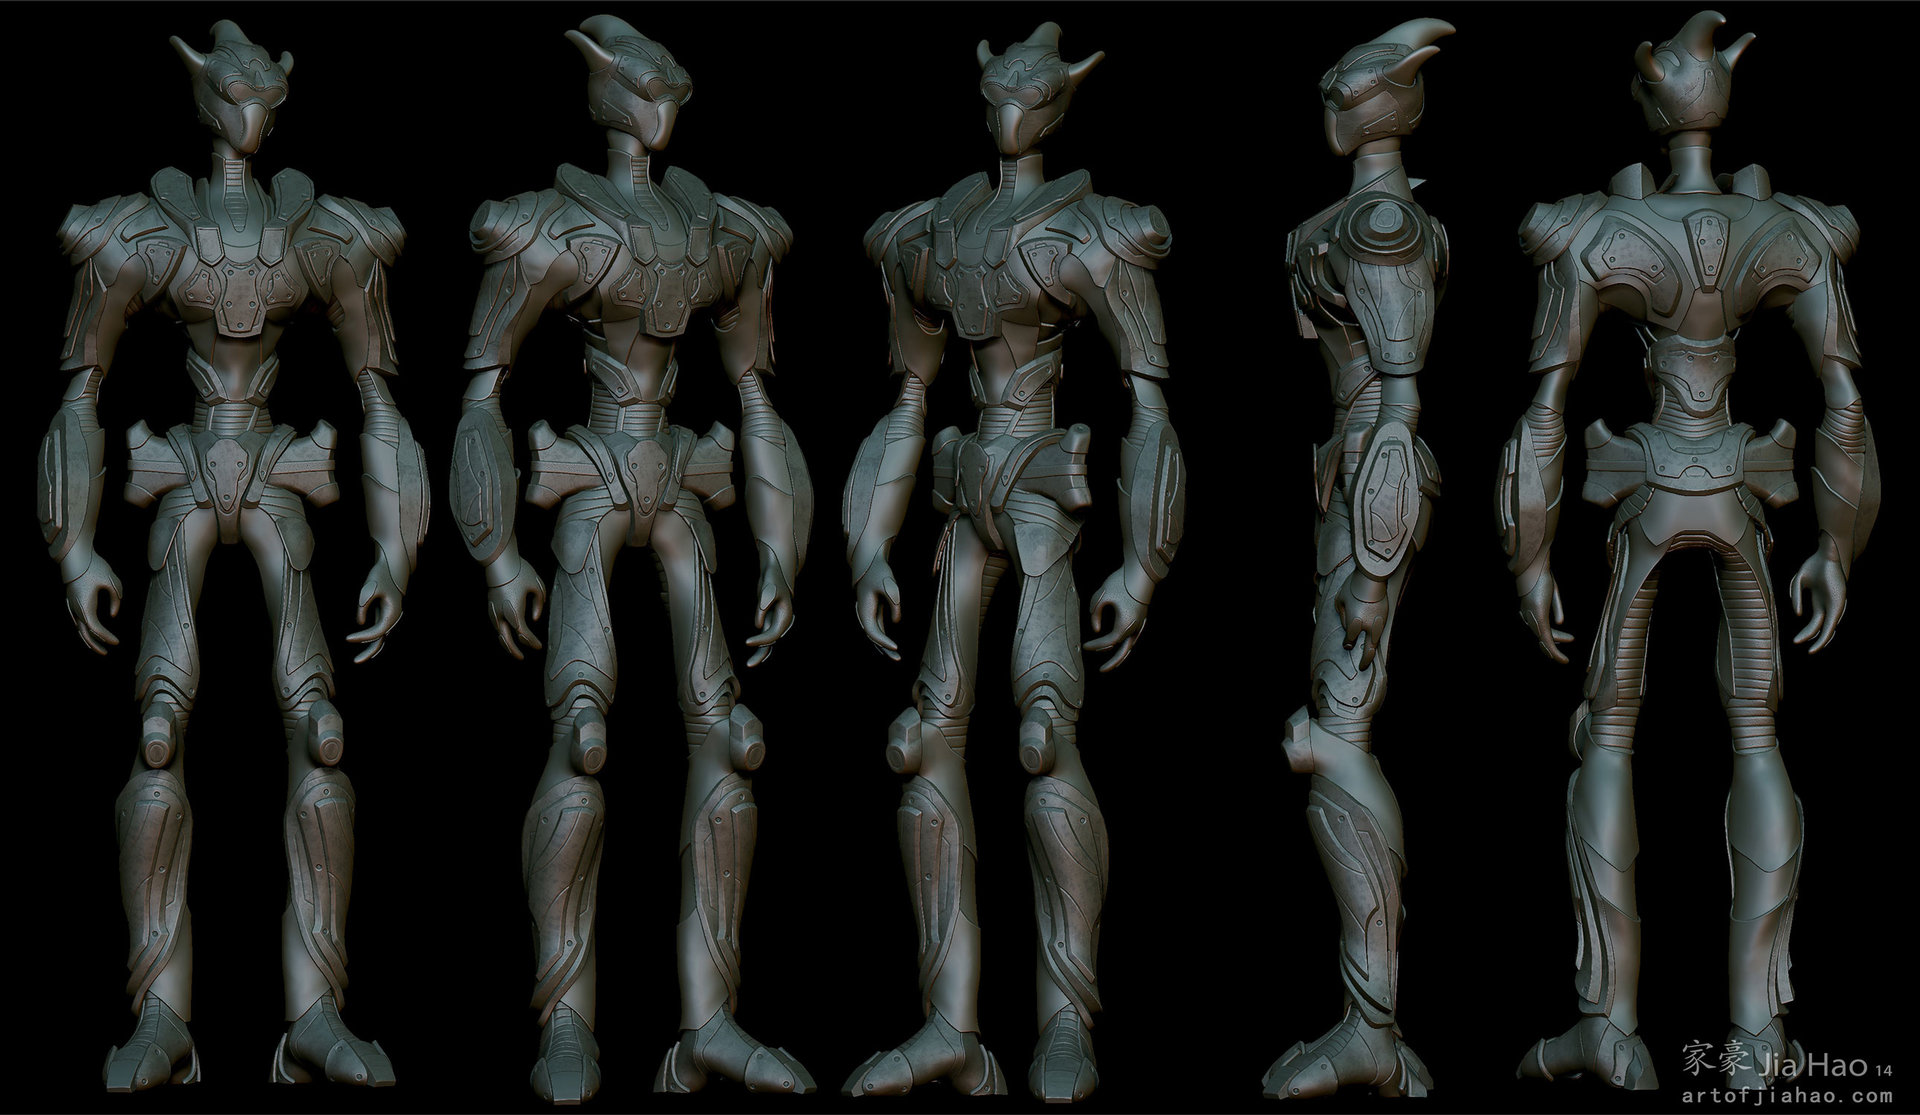 Jia hao 2014 03 alienarmor 01 views sculpt2